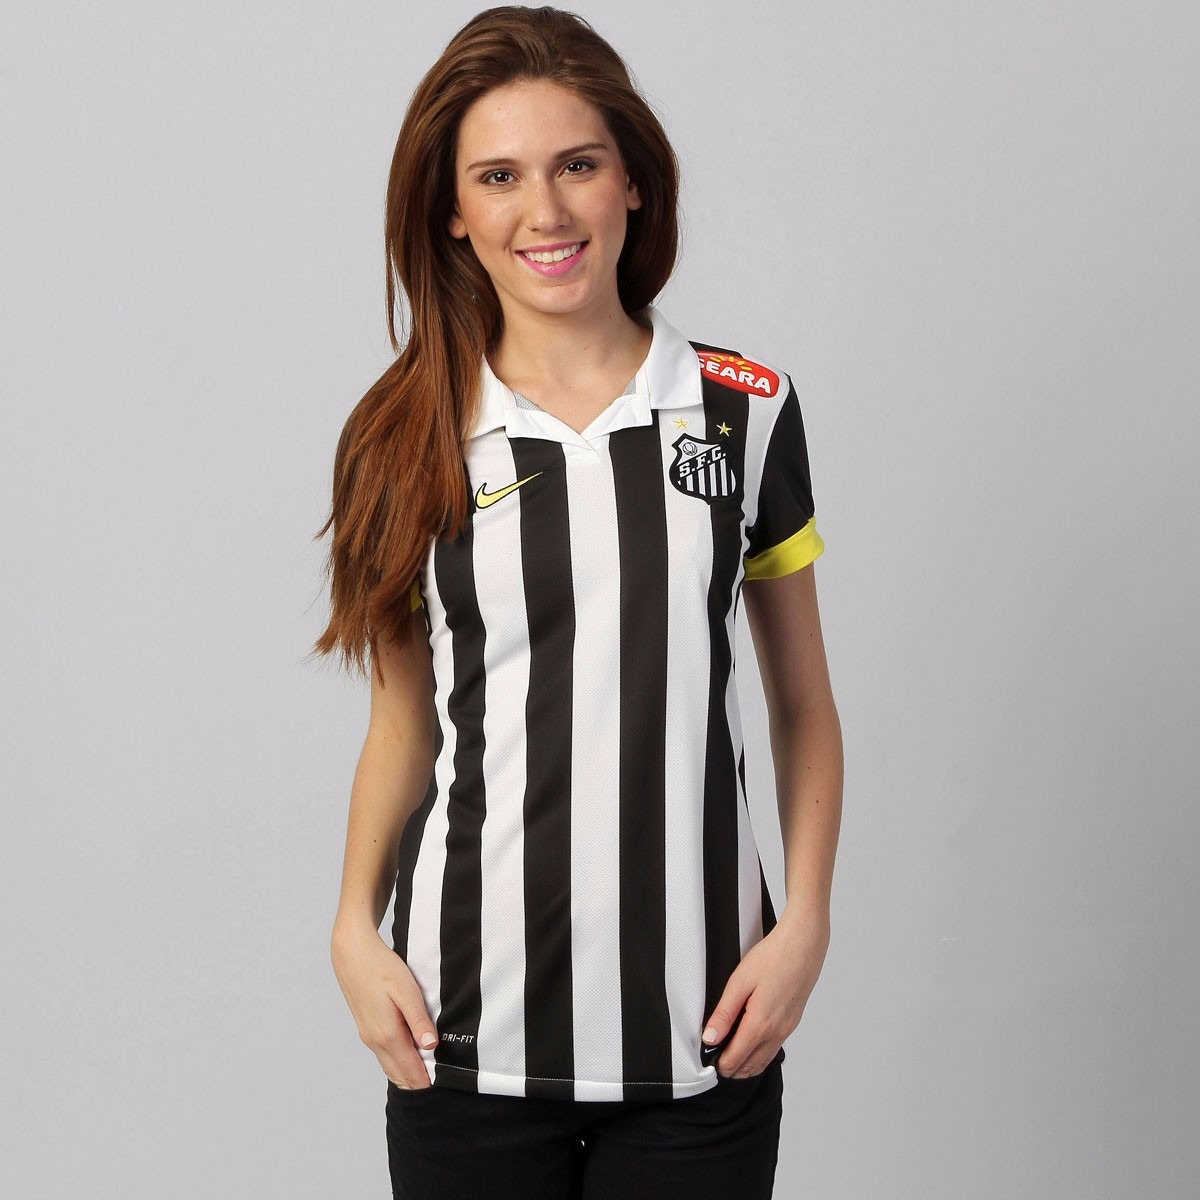 0d82e0ab71 Camisa Feminina Nike Santos Ii 13 14 Original - R  96